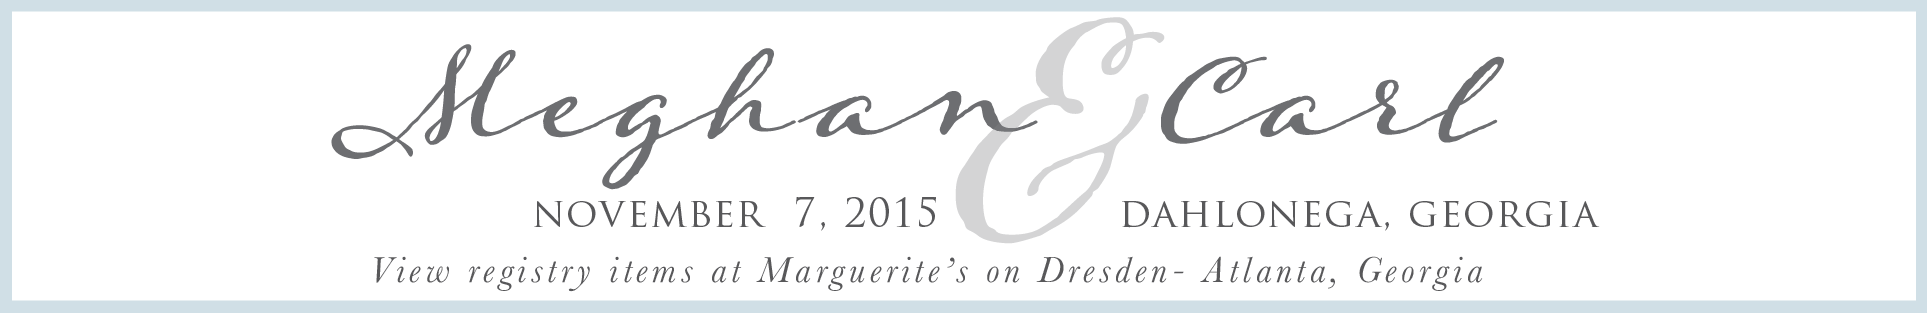 massey-garofalo-registry-marguerite-s-01.png